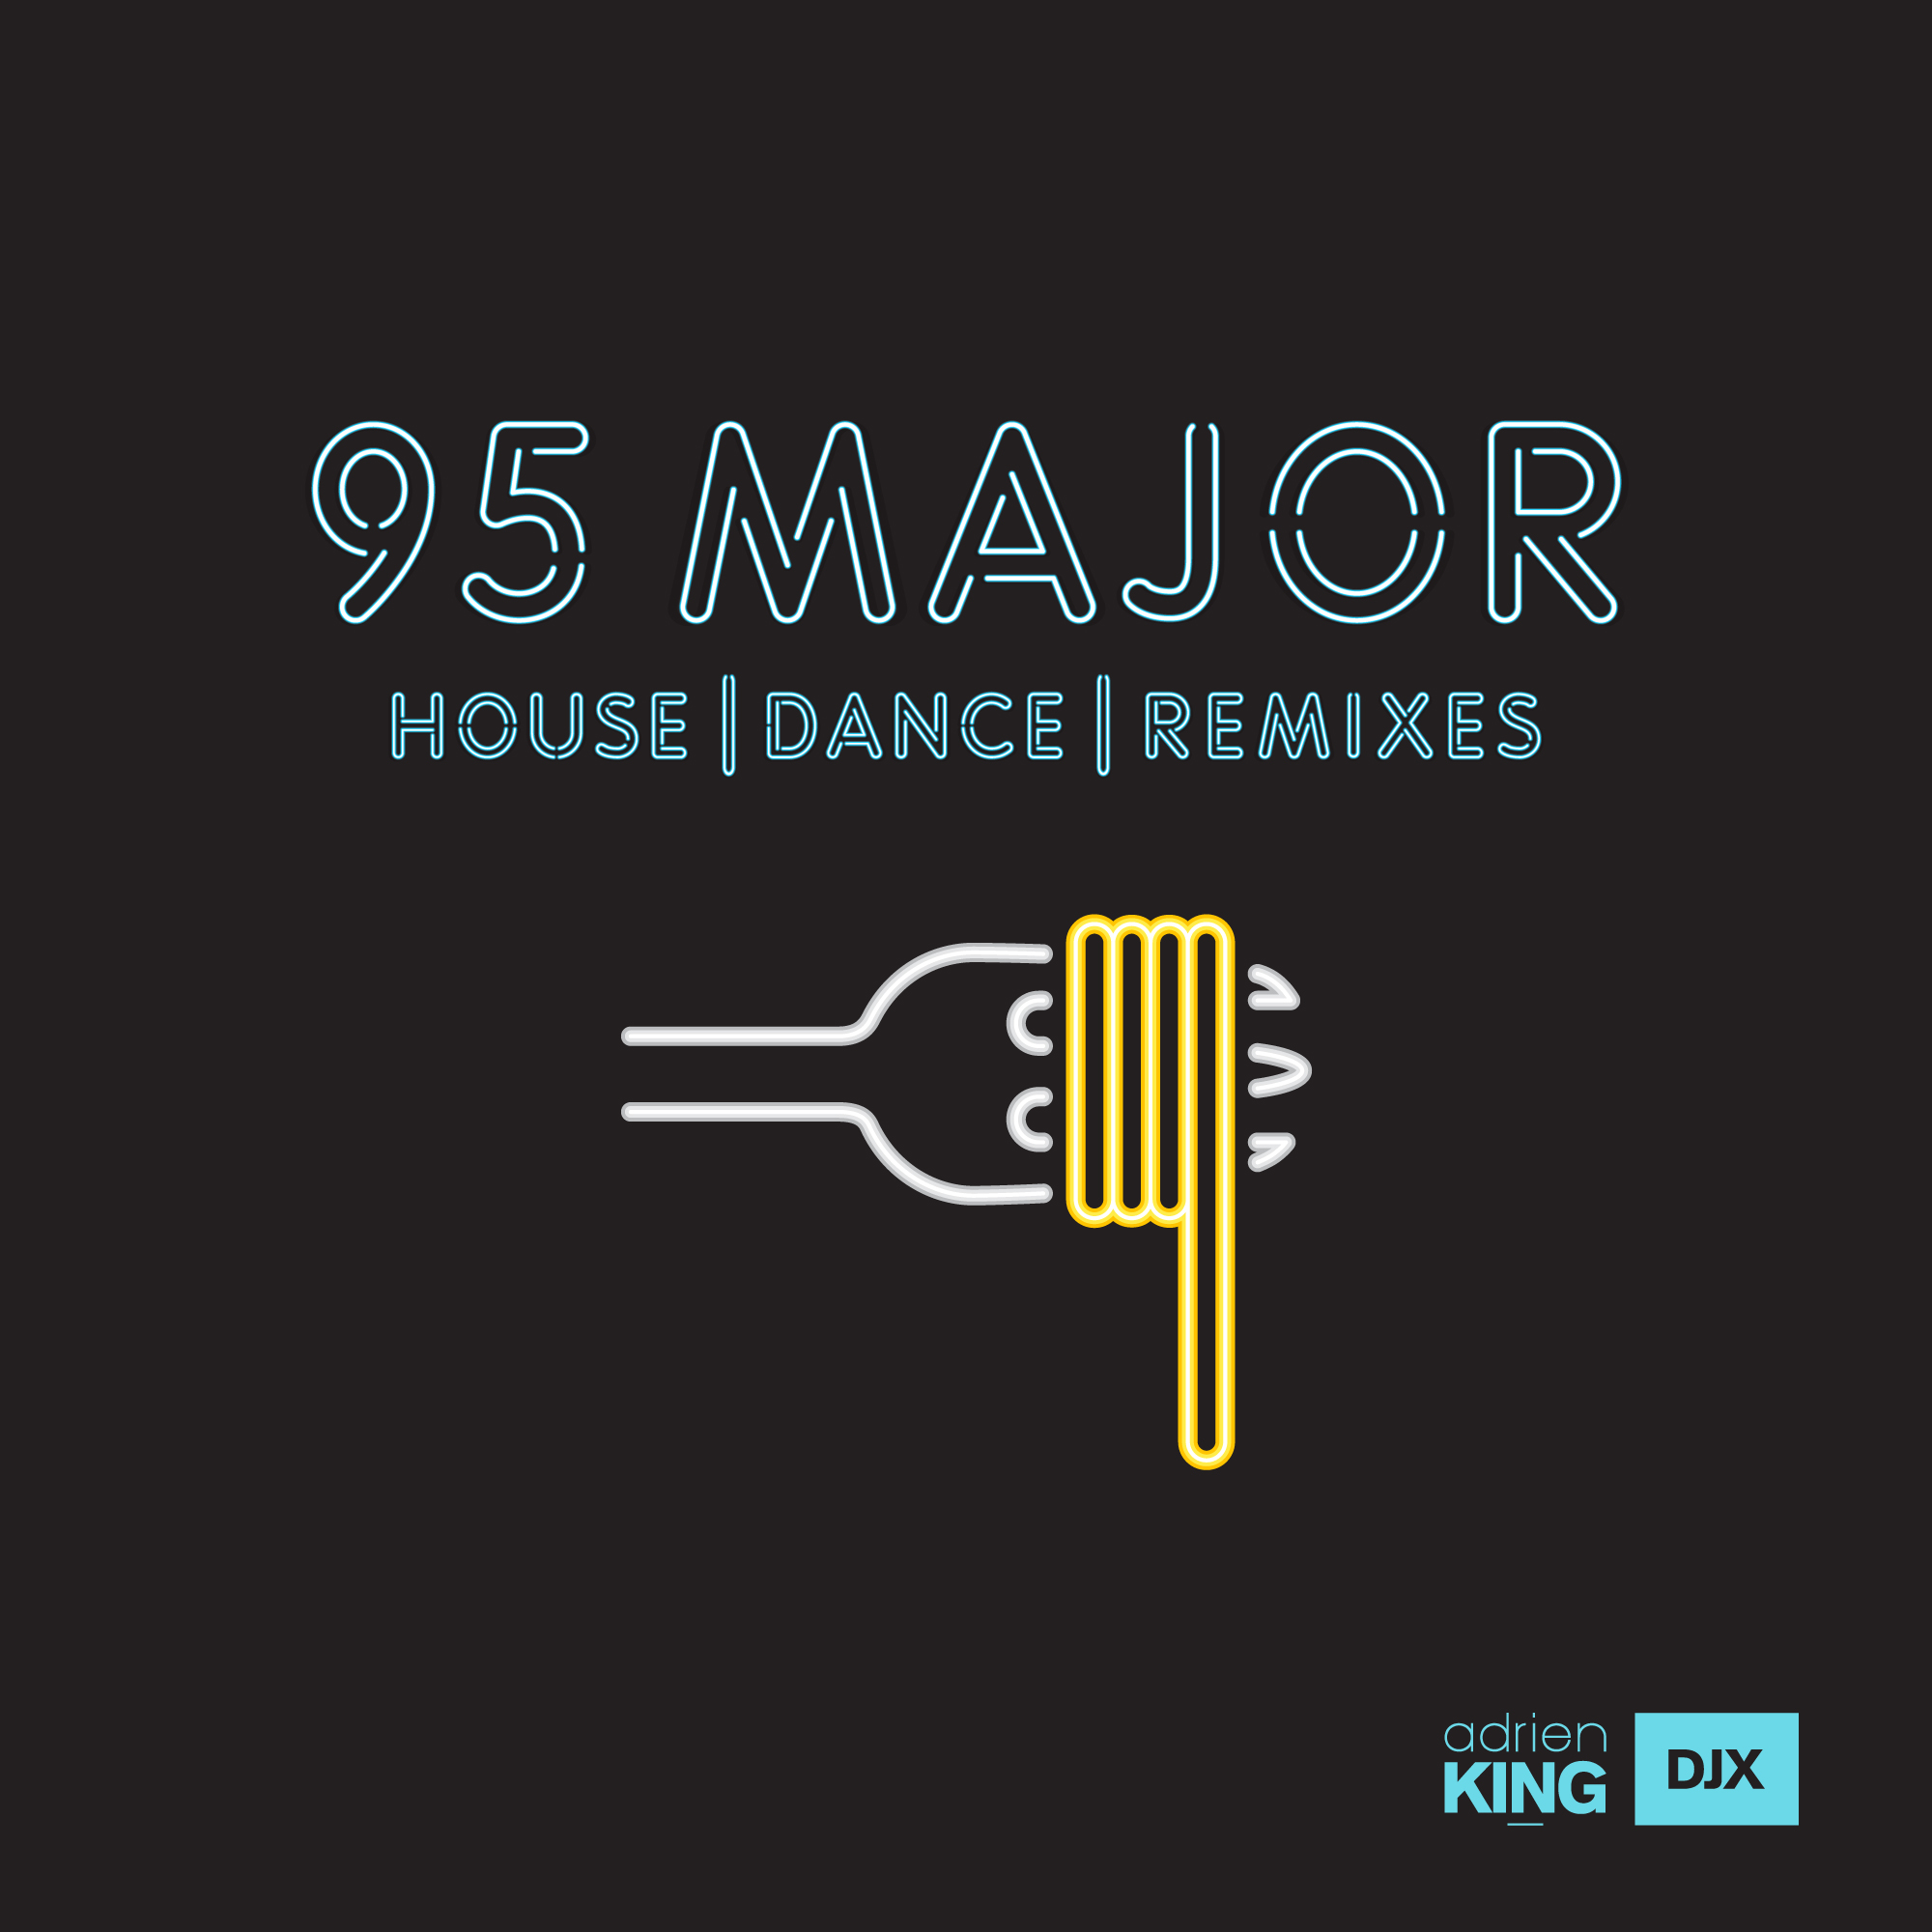 95 Major - Mixtape - Adrien DJX King